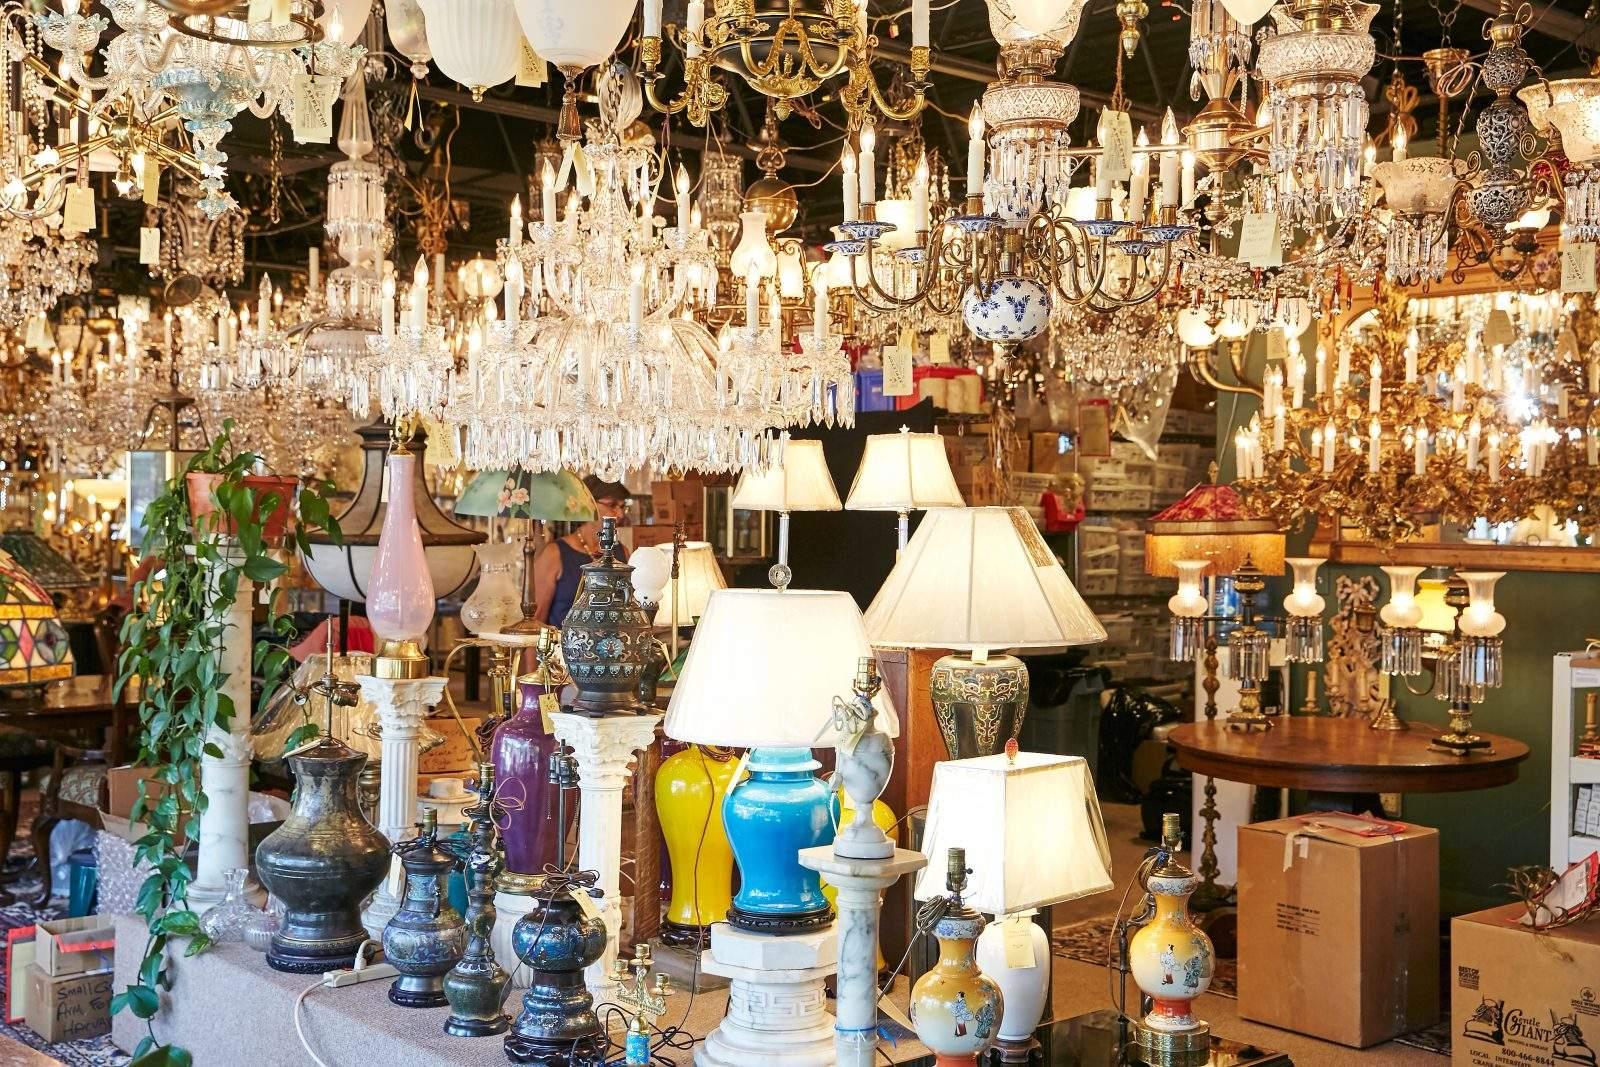 Collection of Restored Antique Lighting at Appleton Antique Lighting